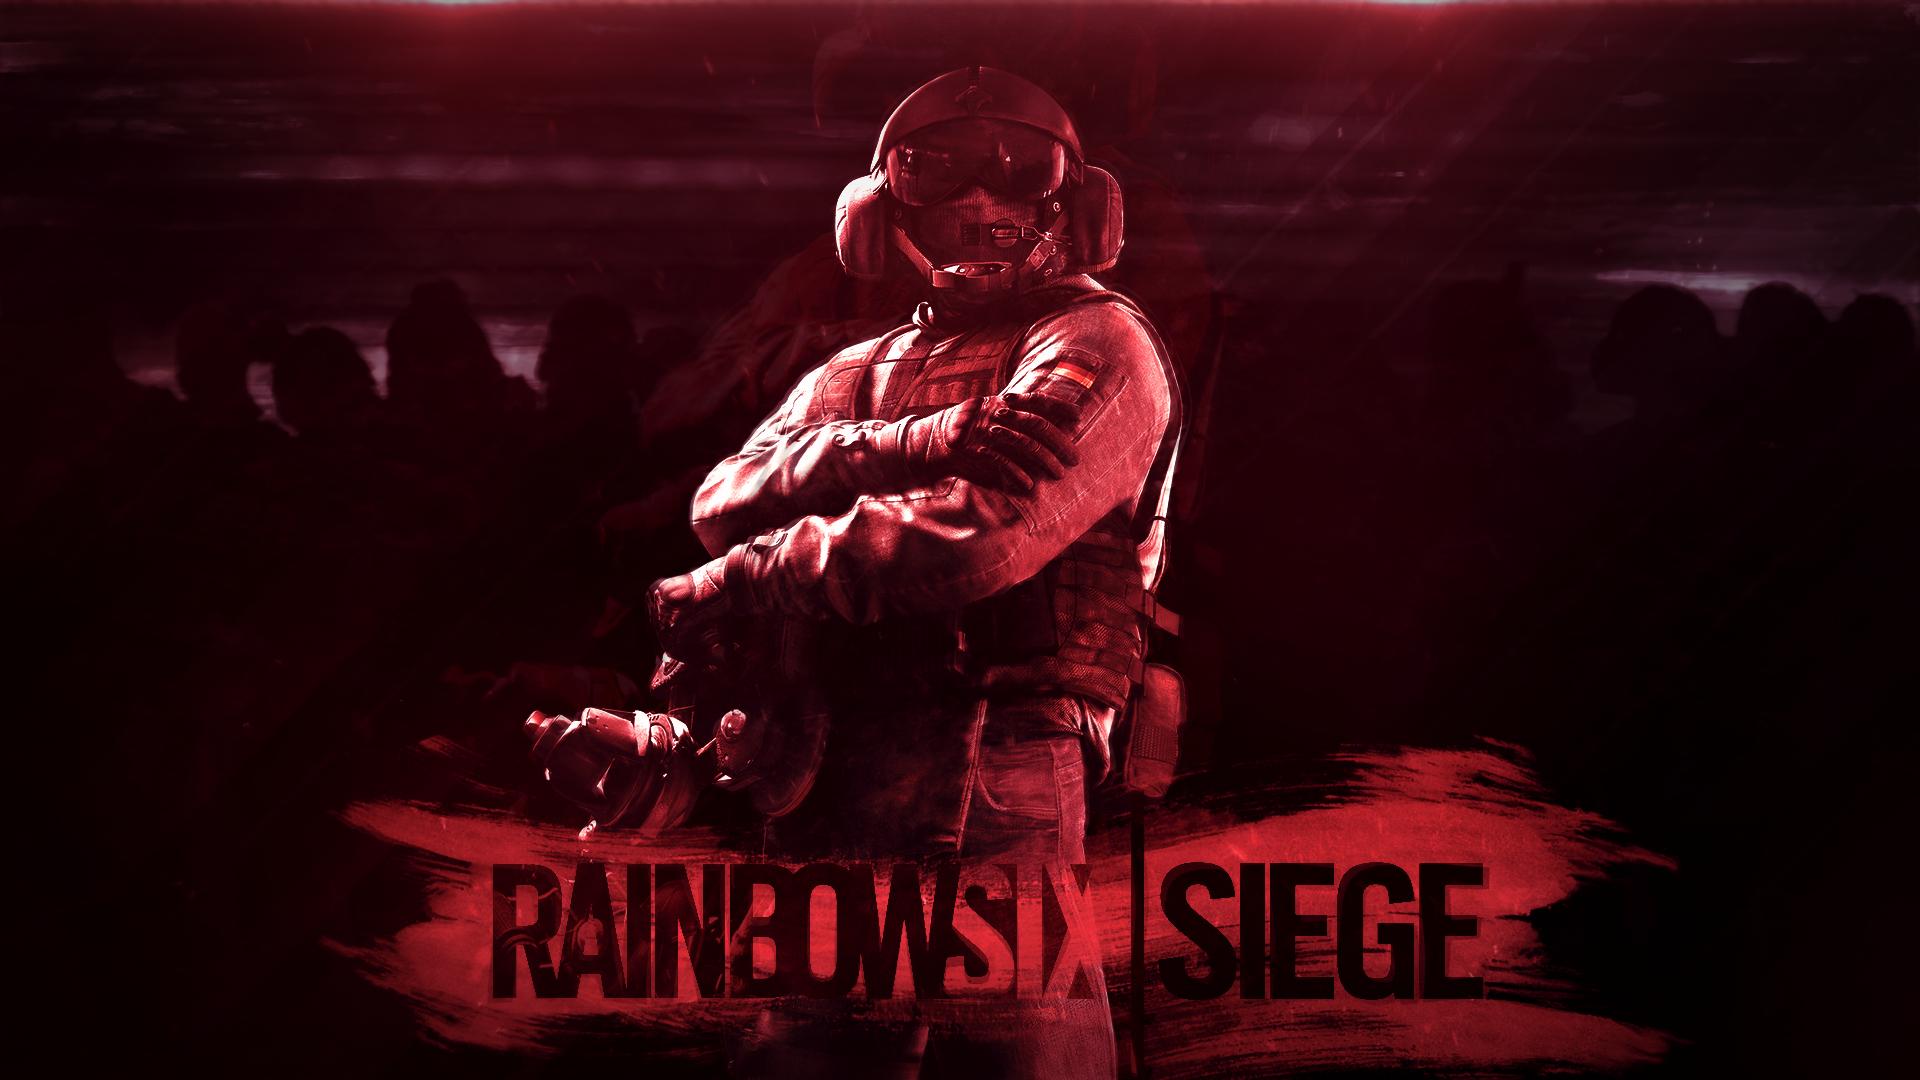 Steam Topluluğu Red Themed Rainbow Six Siege Wallpaper